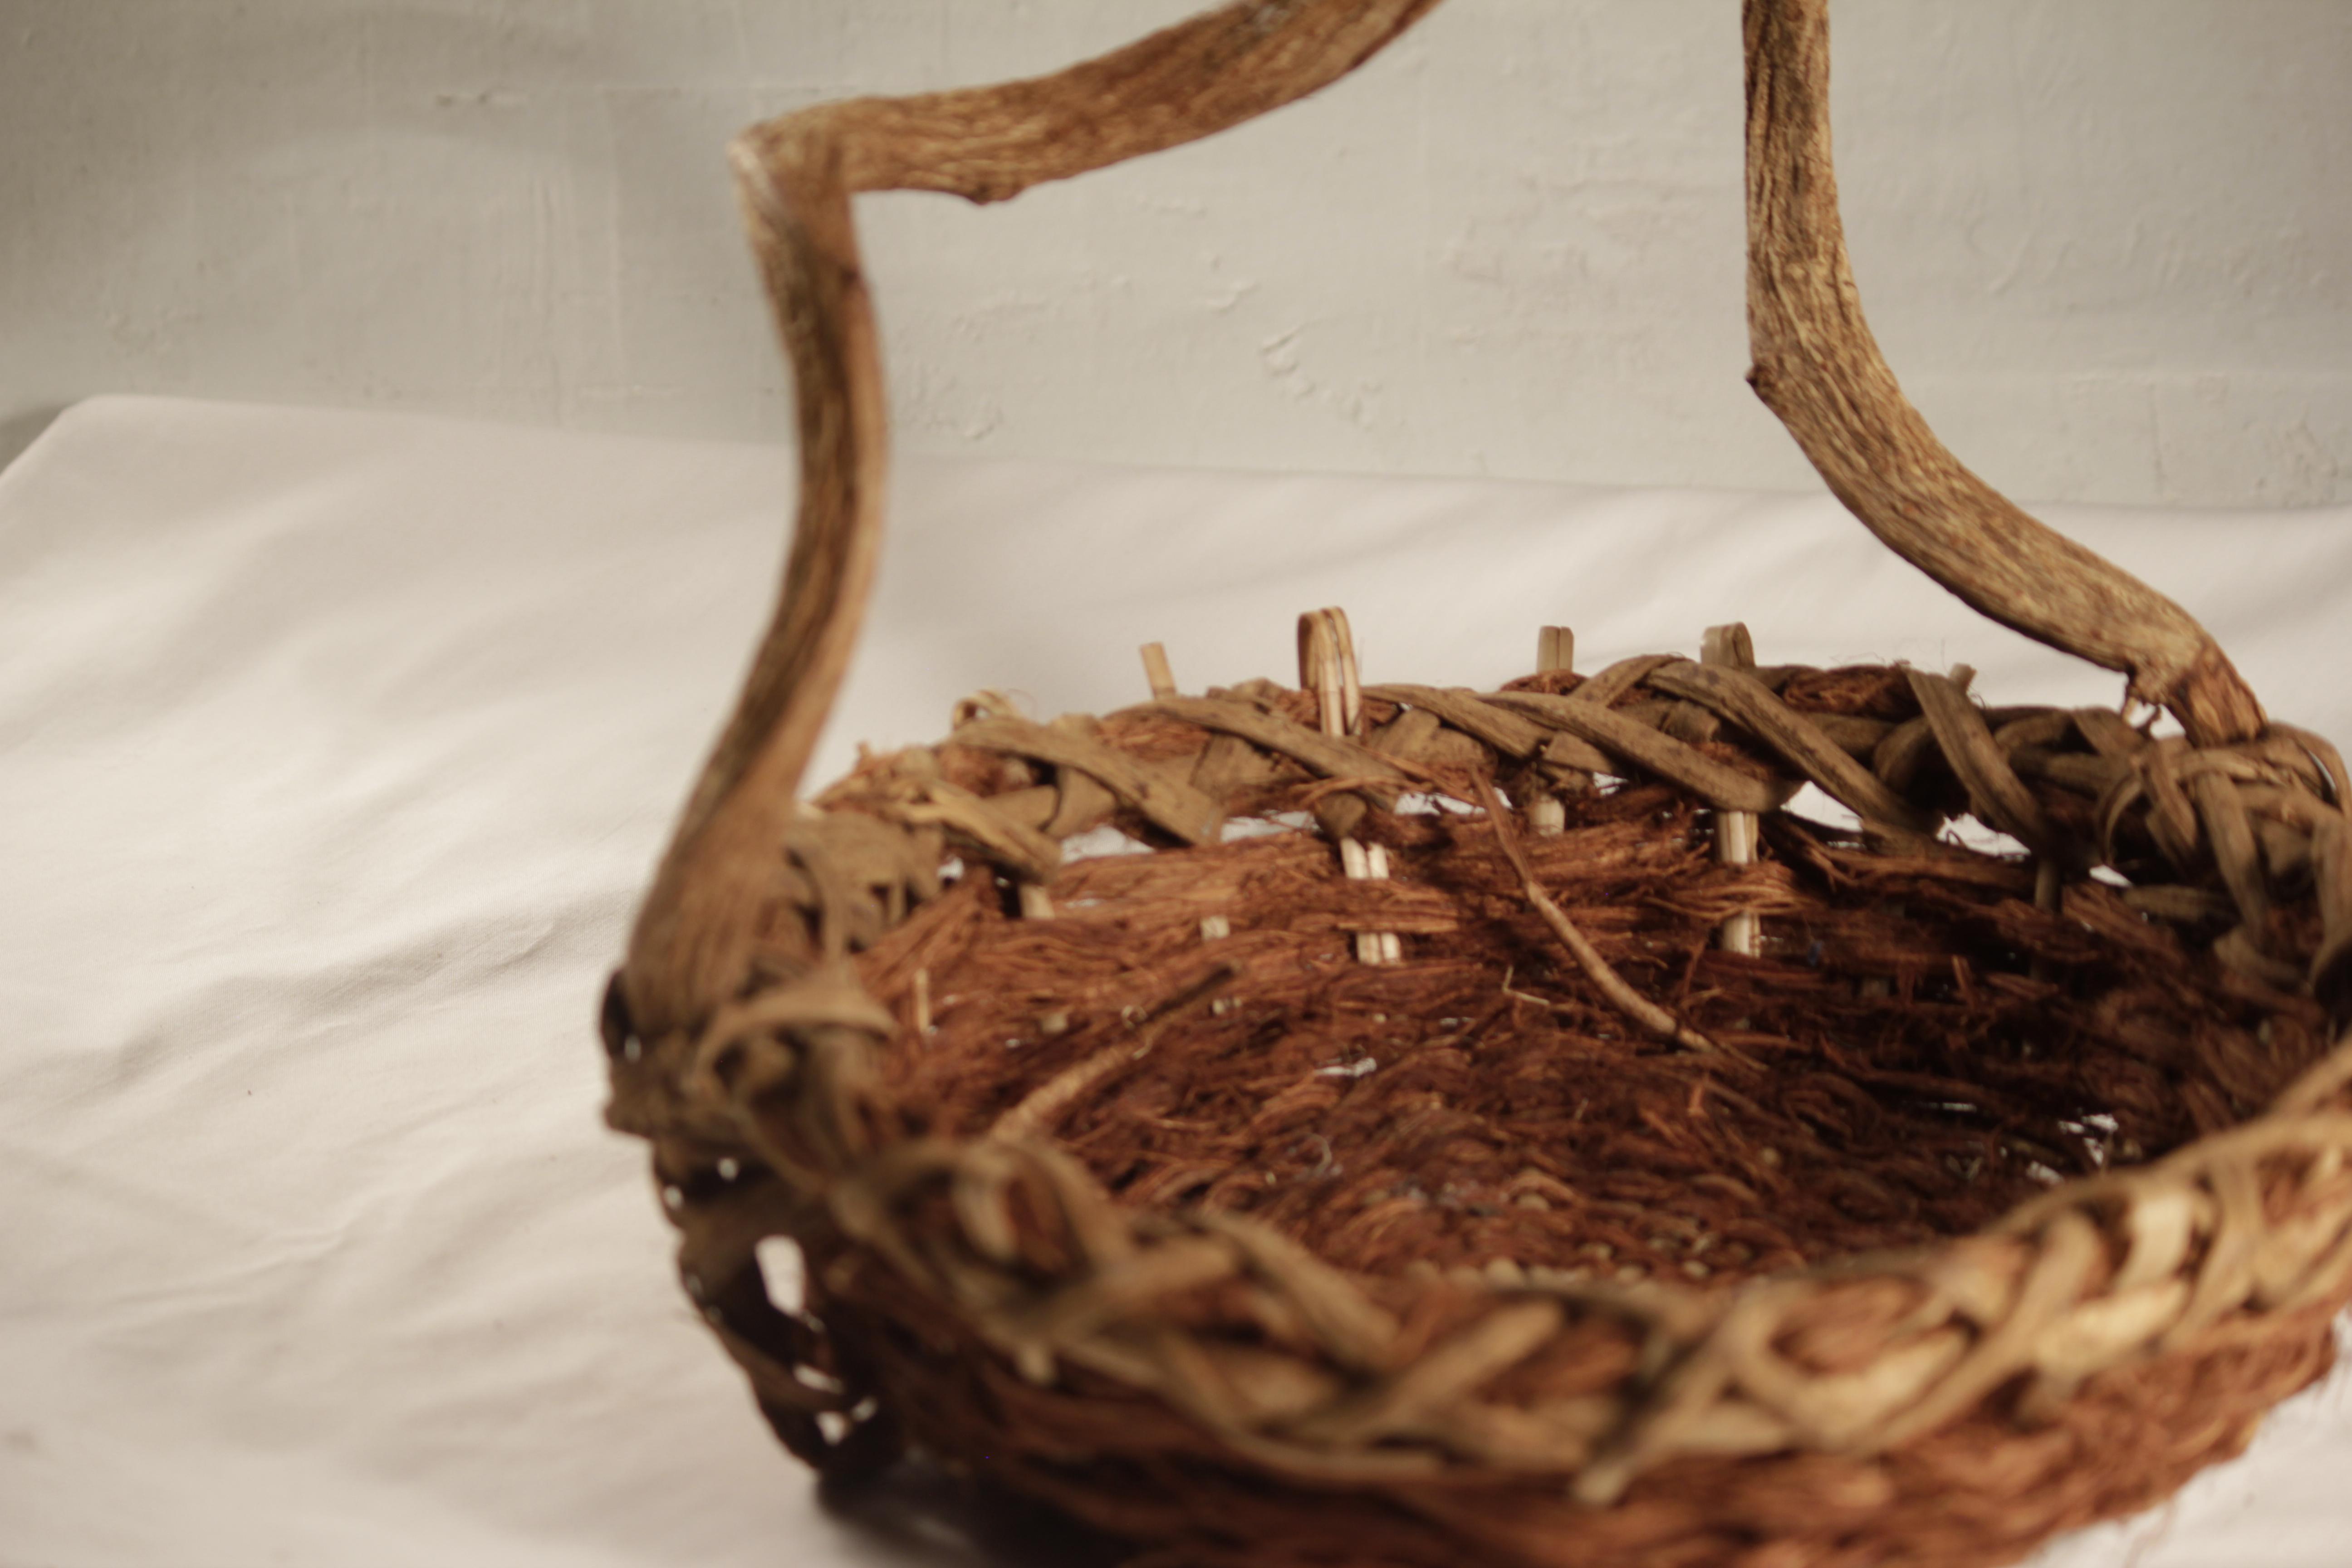 Basket, Gnarled Handle